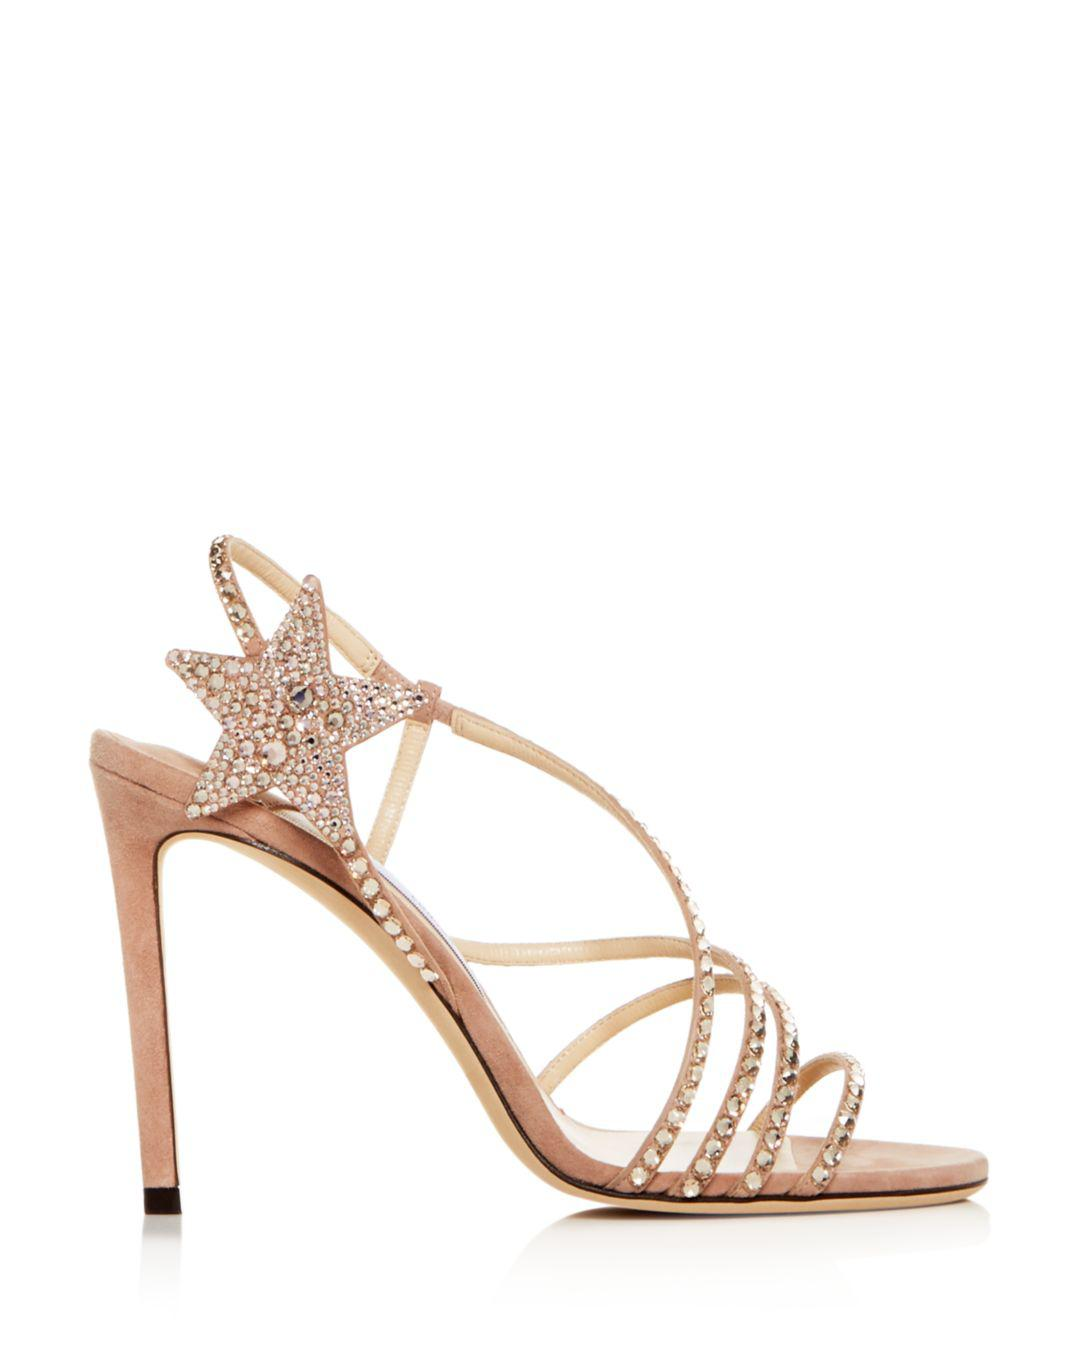 aae9c9853c08 Lyst - Jimmy Choo Women s Lynn 100 Embellished Slingback High-heel Sandals  in Pink